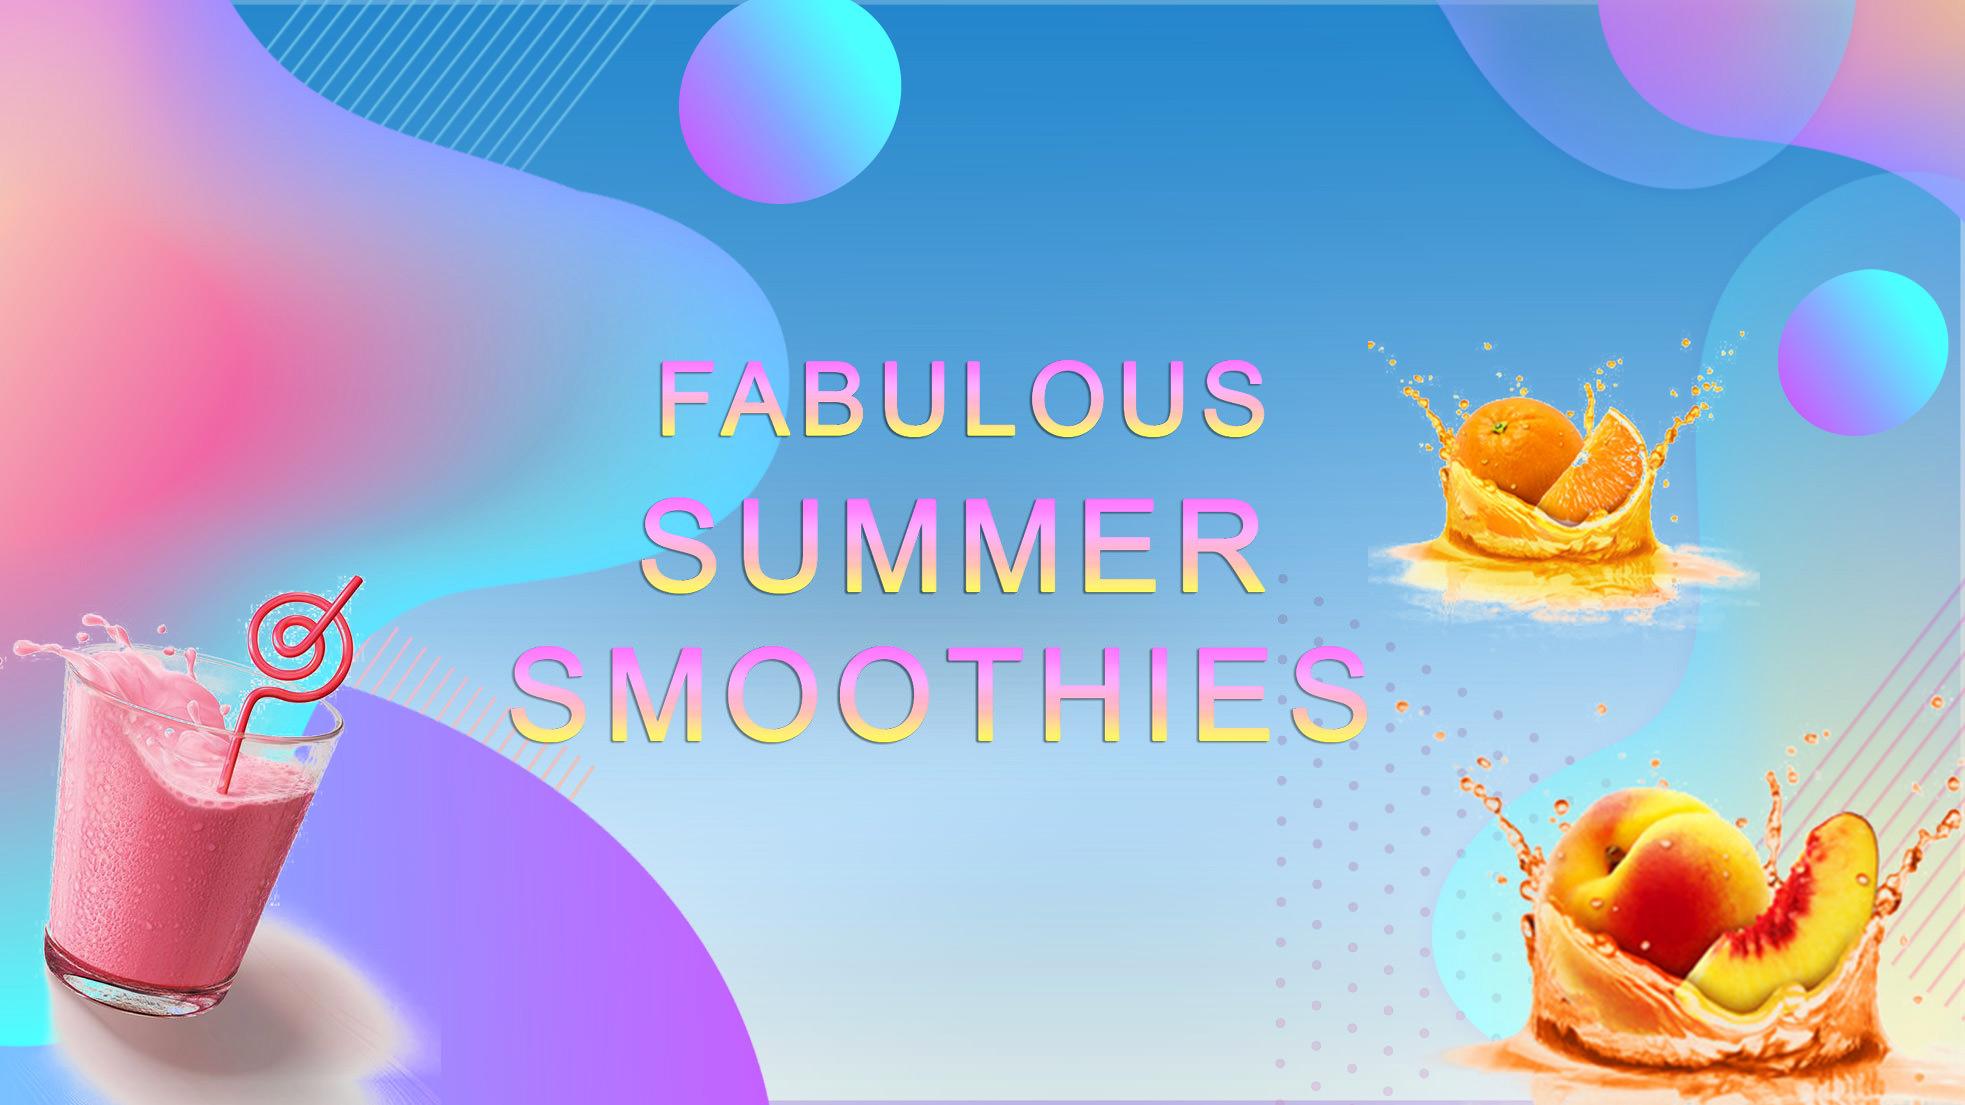 fabulous-summer-smoothies-from-prairie-donair.jpg